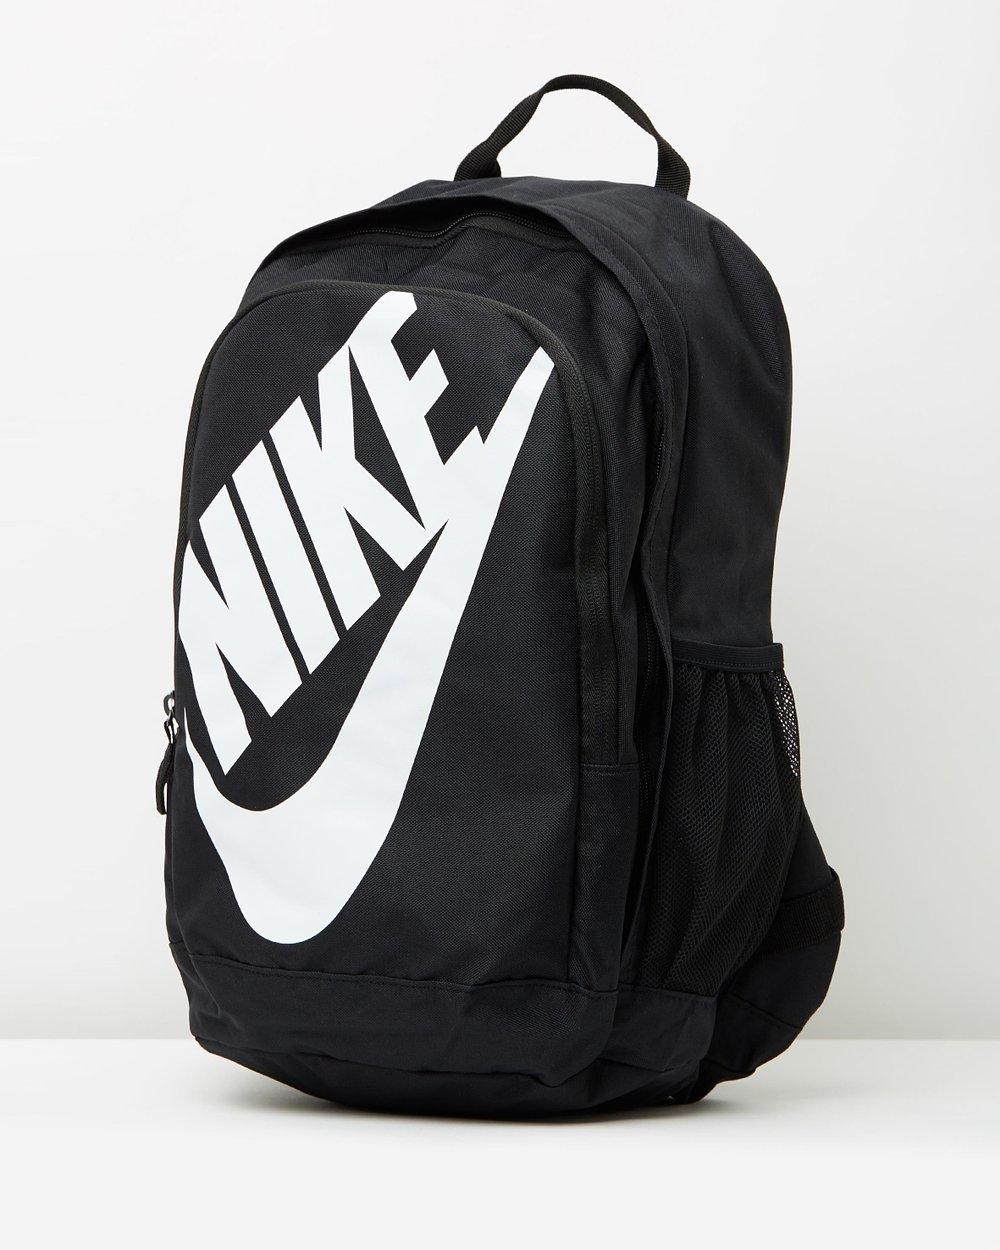 70d0ed75c0 Nike Hayward Futura 2.0 by Nike Online